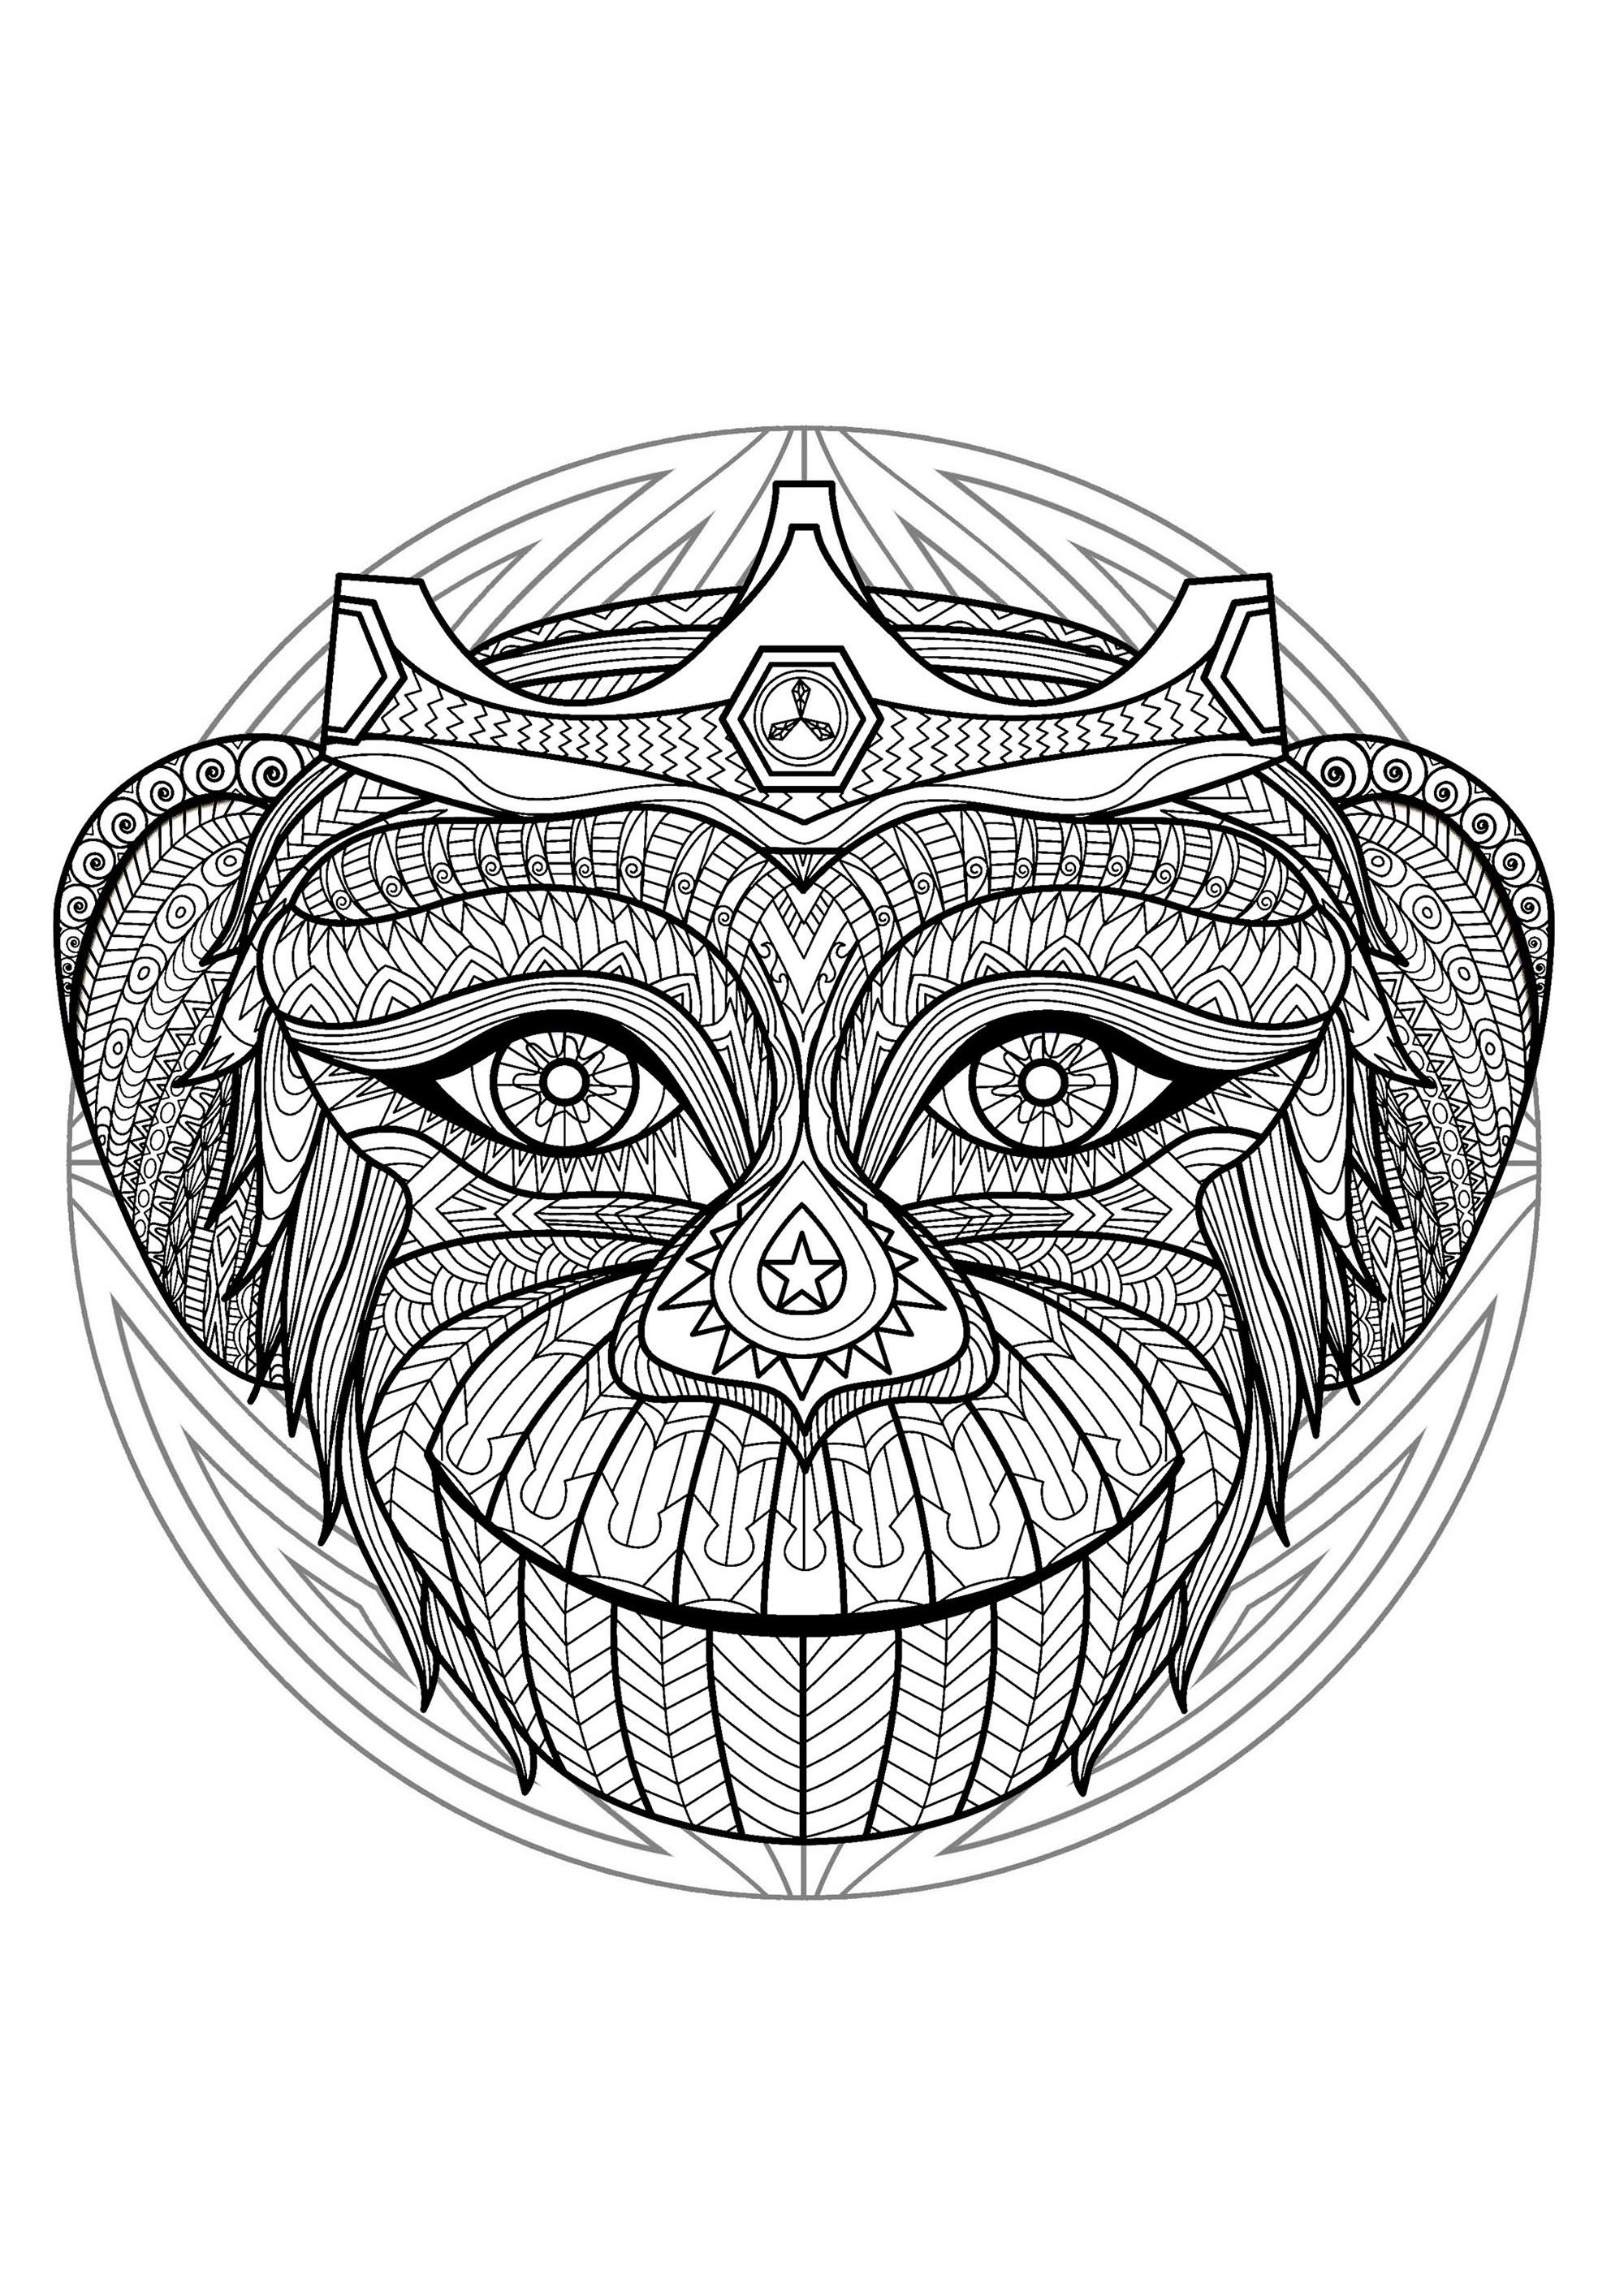 Mandala Tete Singe 2 Mandalas Coloriages Difficiles